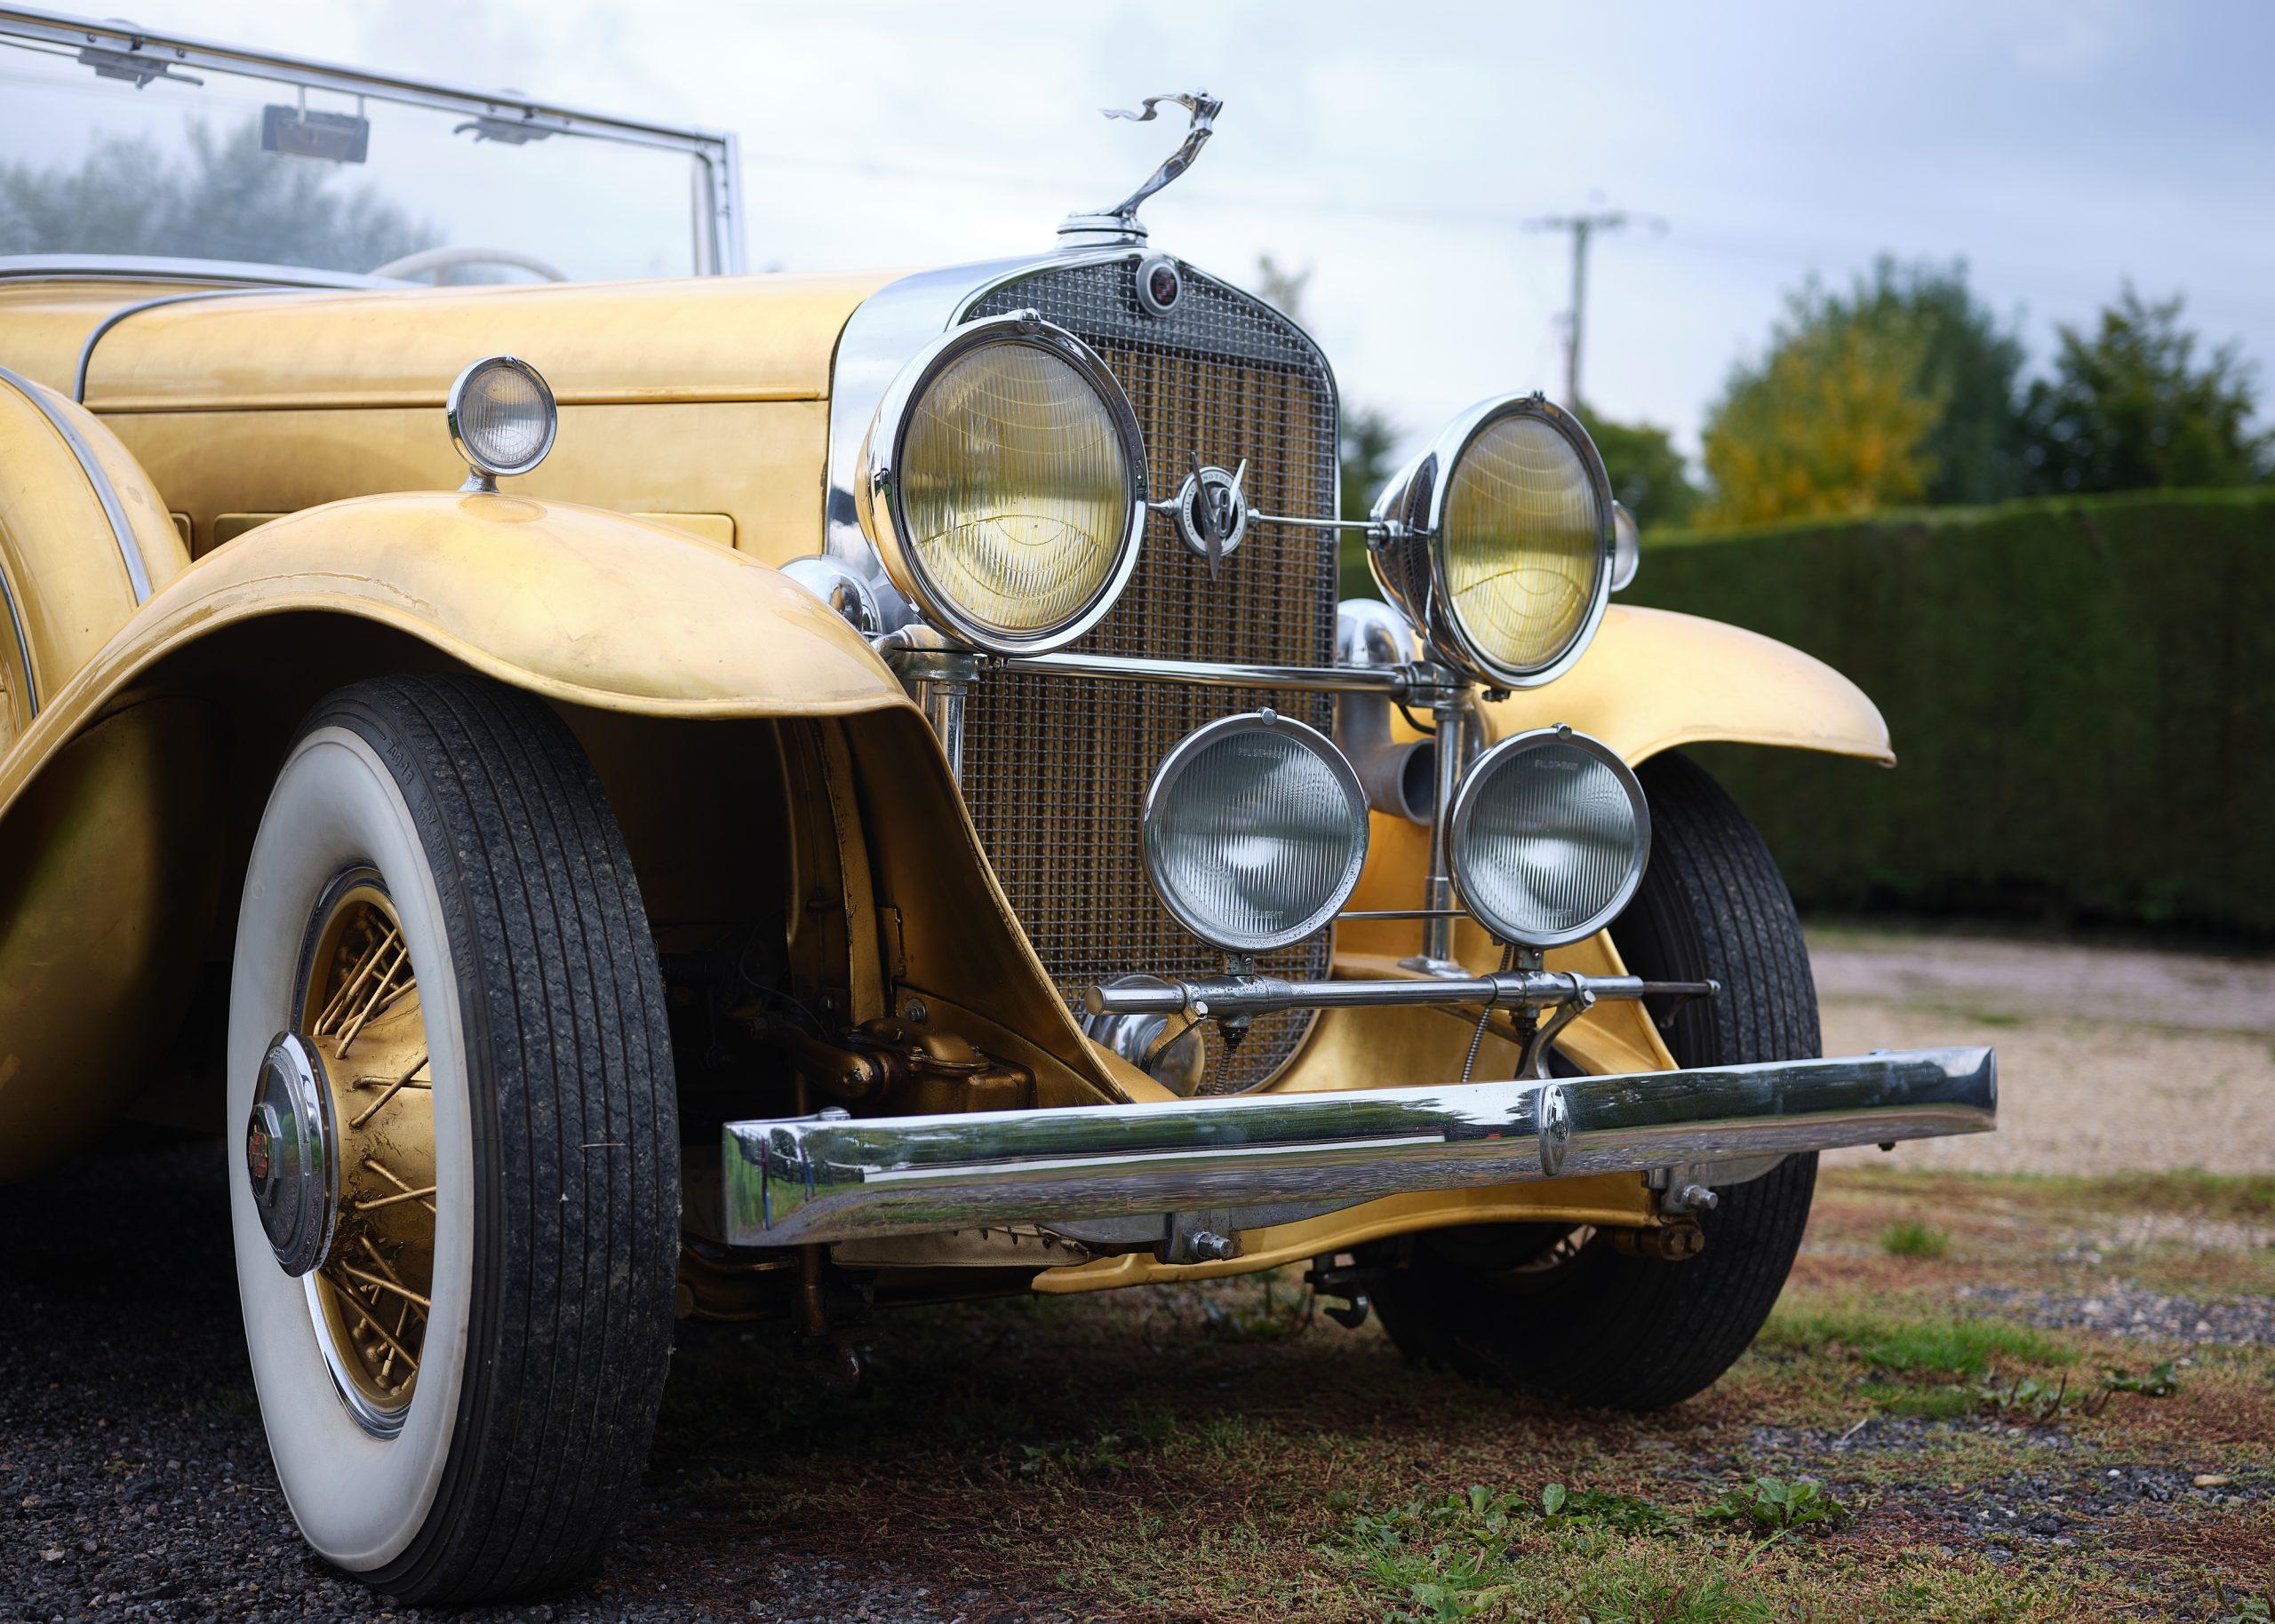 1931 Cadillac V-8 Convertible Coupe front close